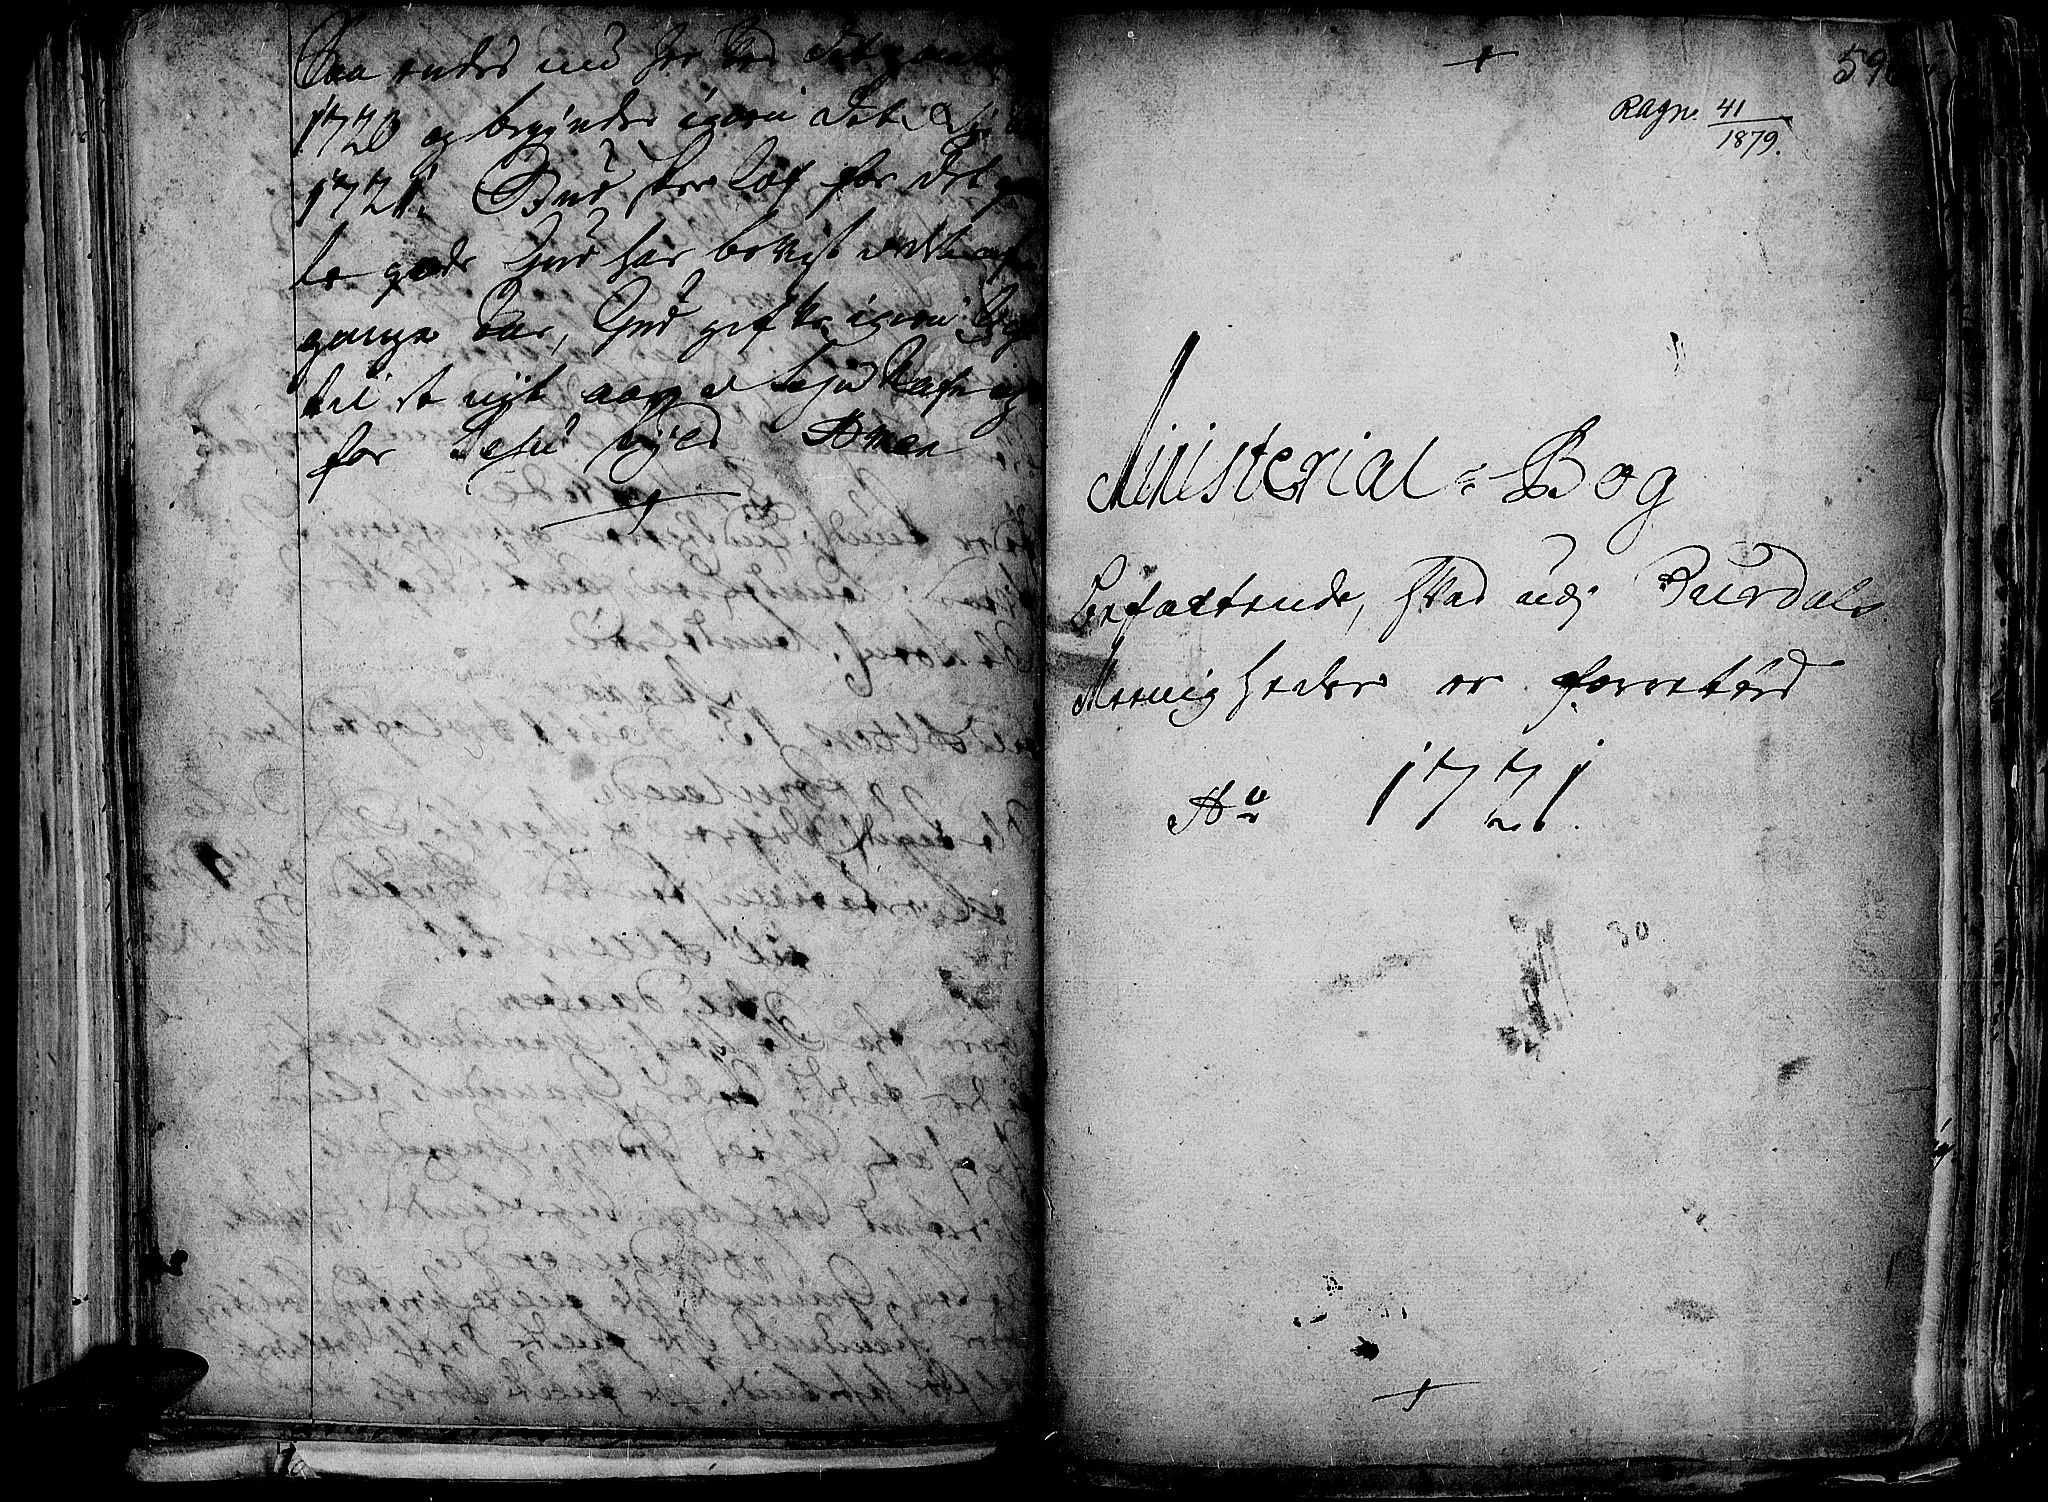 SAH, Aurdal prestekontor, Ministerialbok nr. 1-3, 1692-1730, s. 596